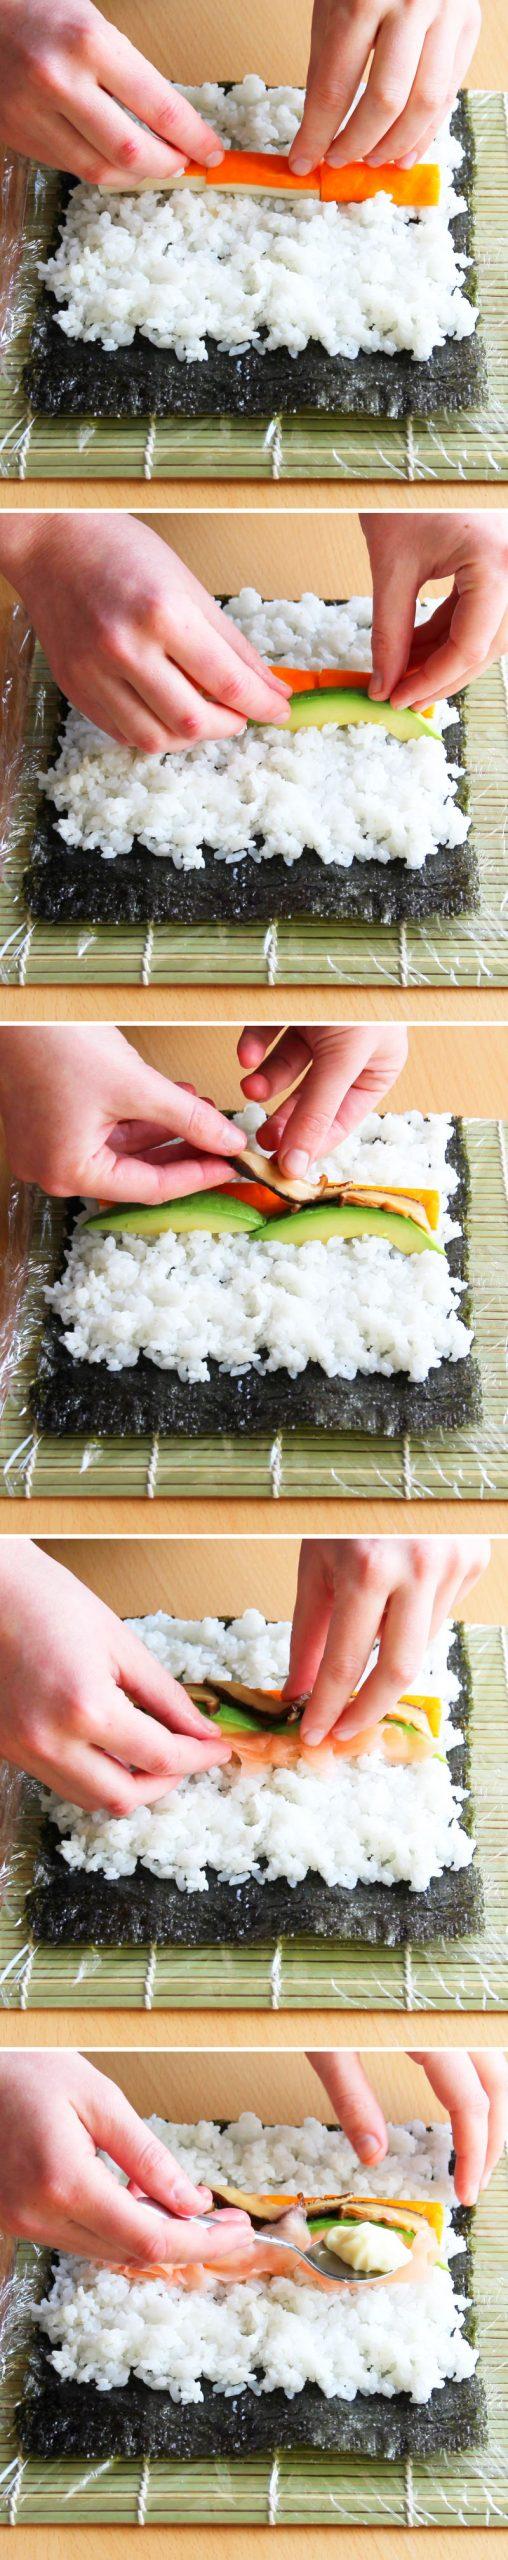 Futomaki Schritt 8 Sushi-Rolle formen